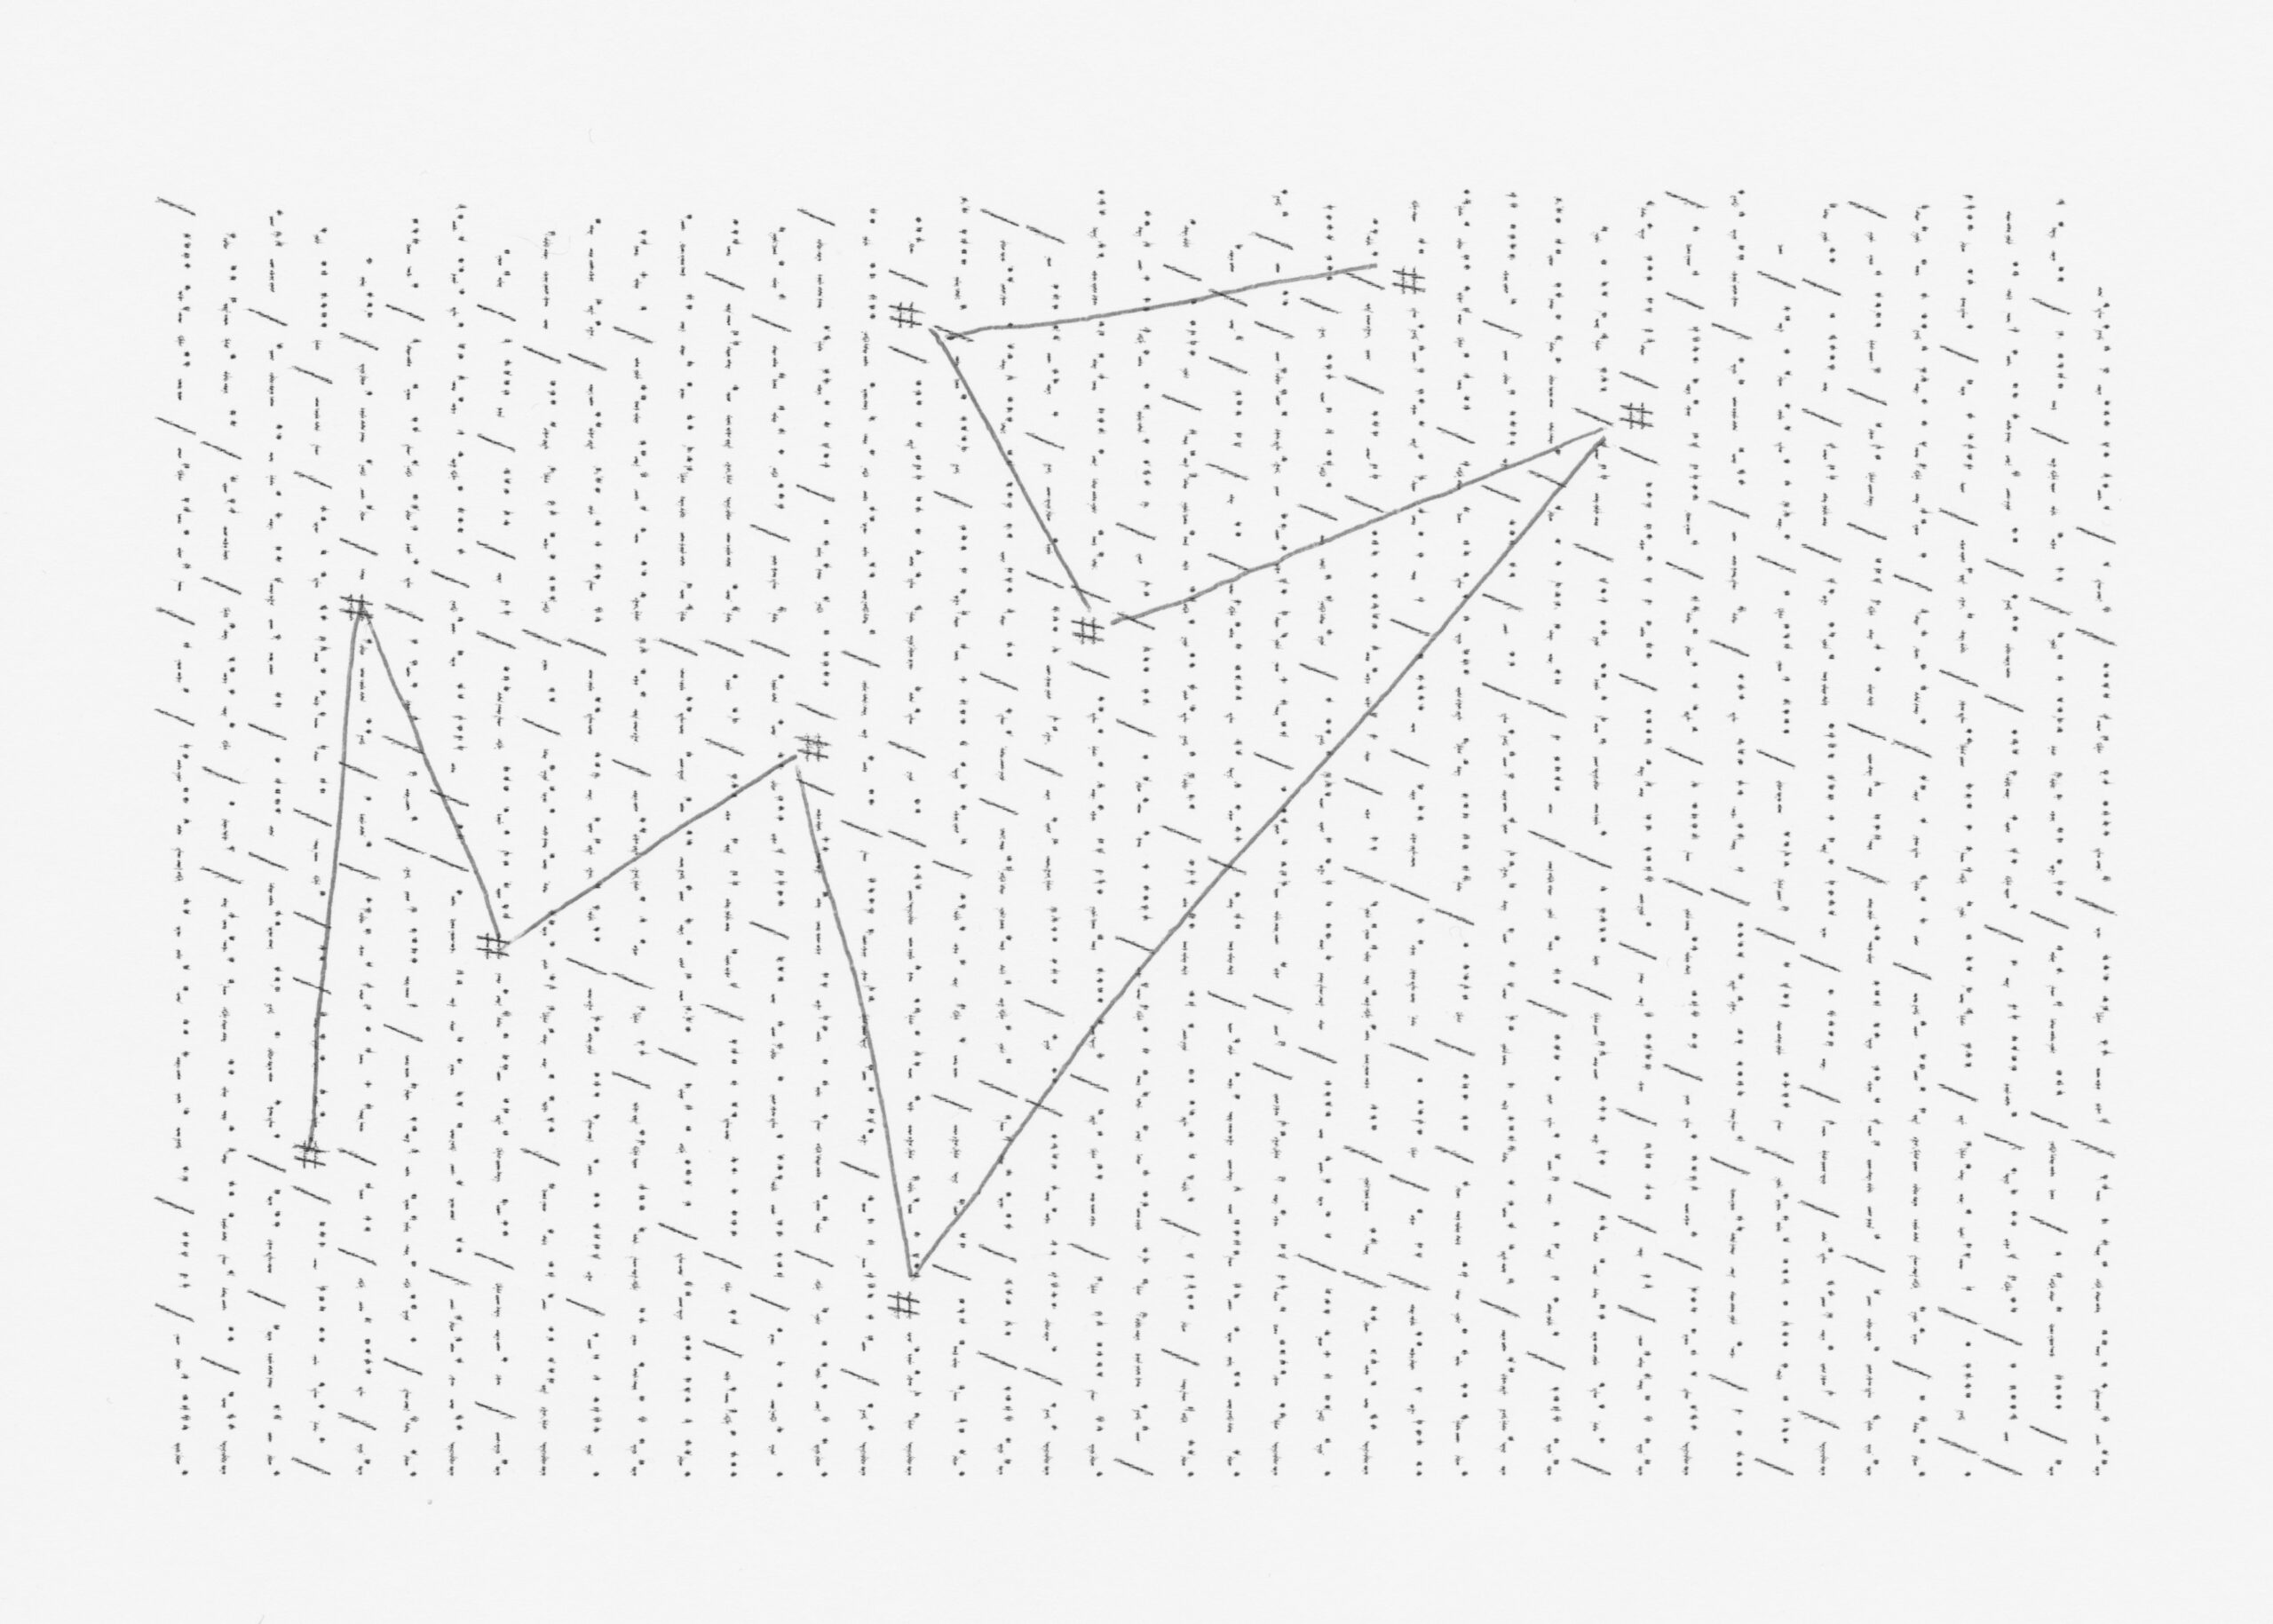 A_2020_04_23_scans_total_morseknittingScan-27